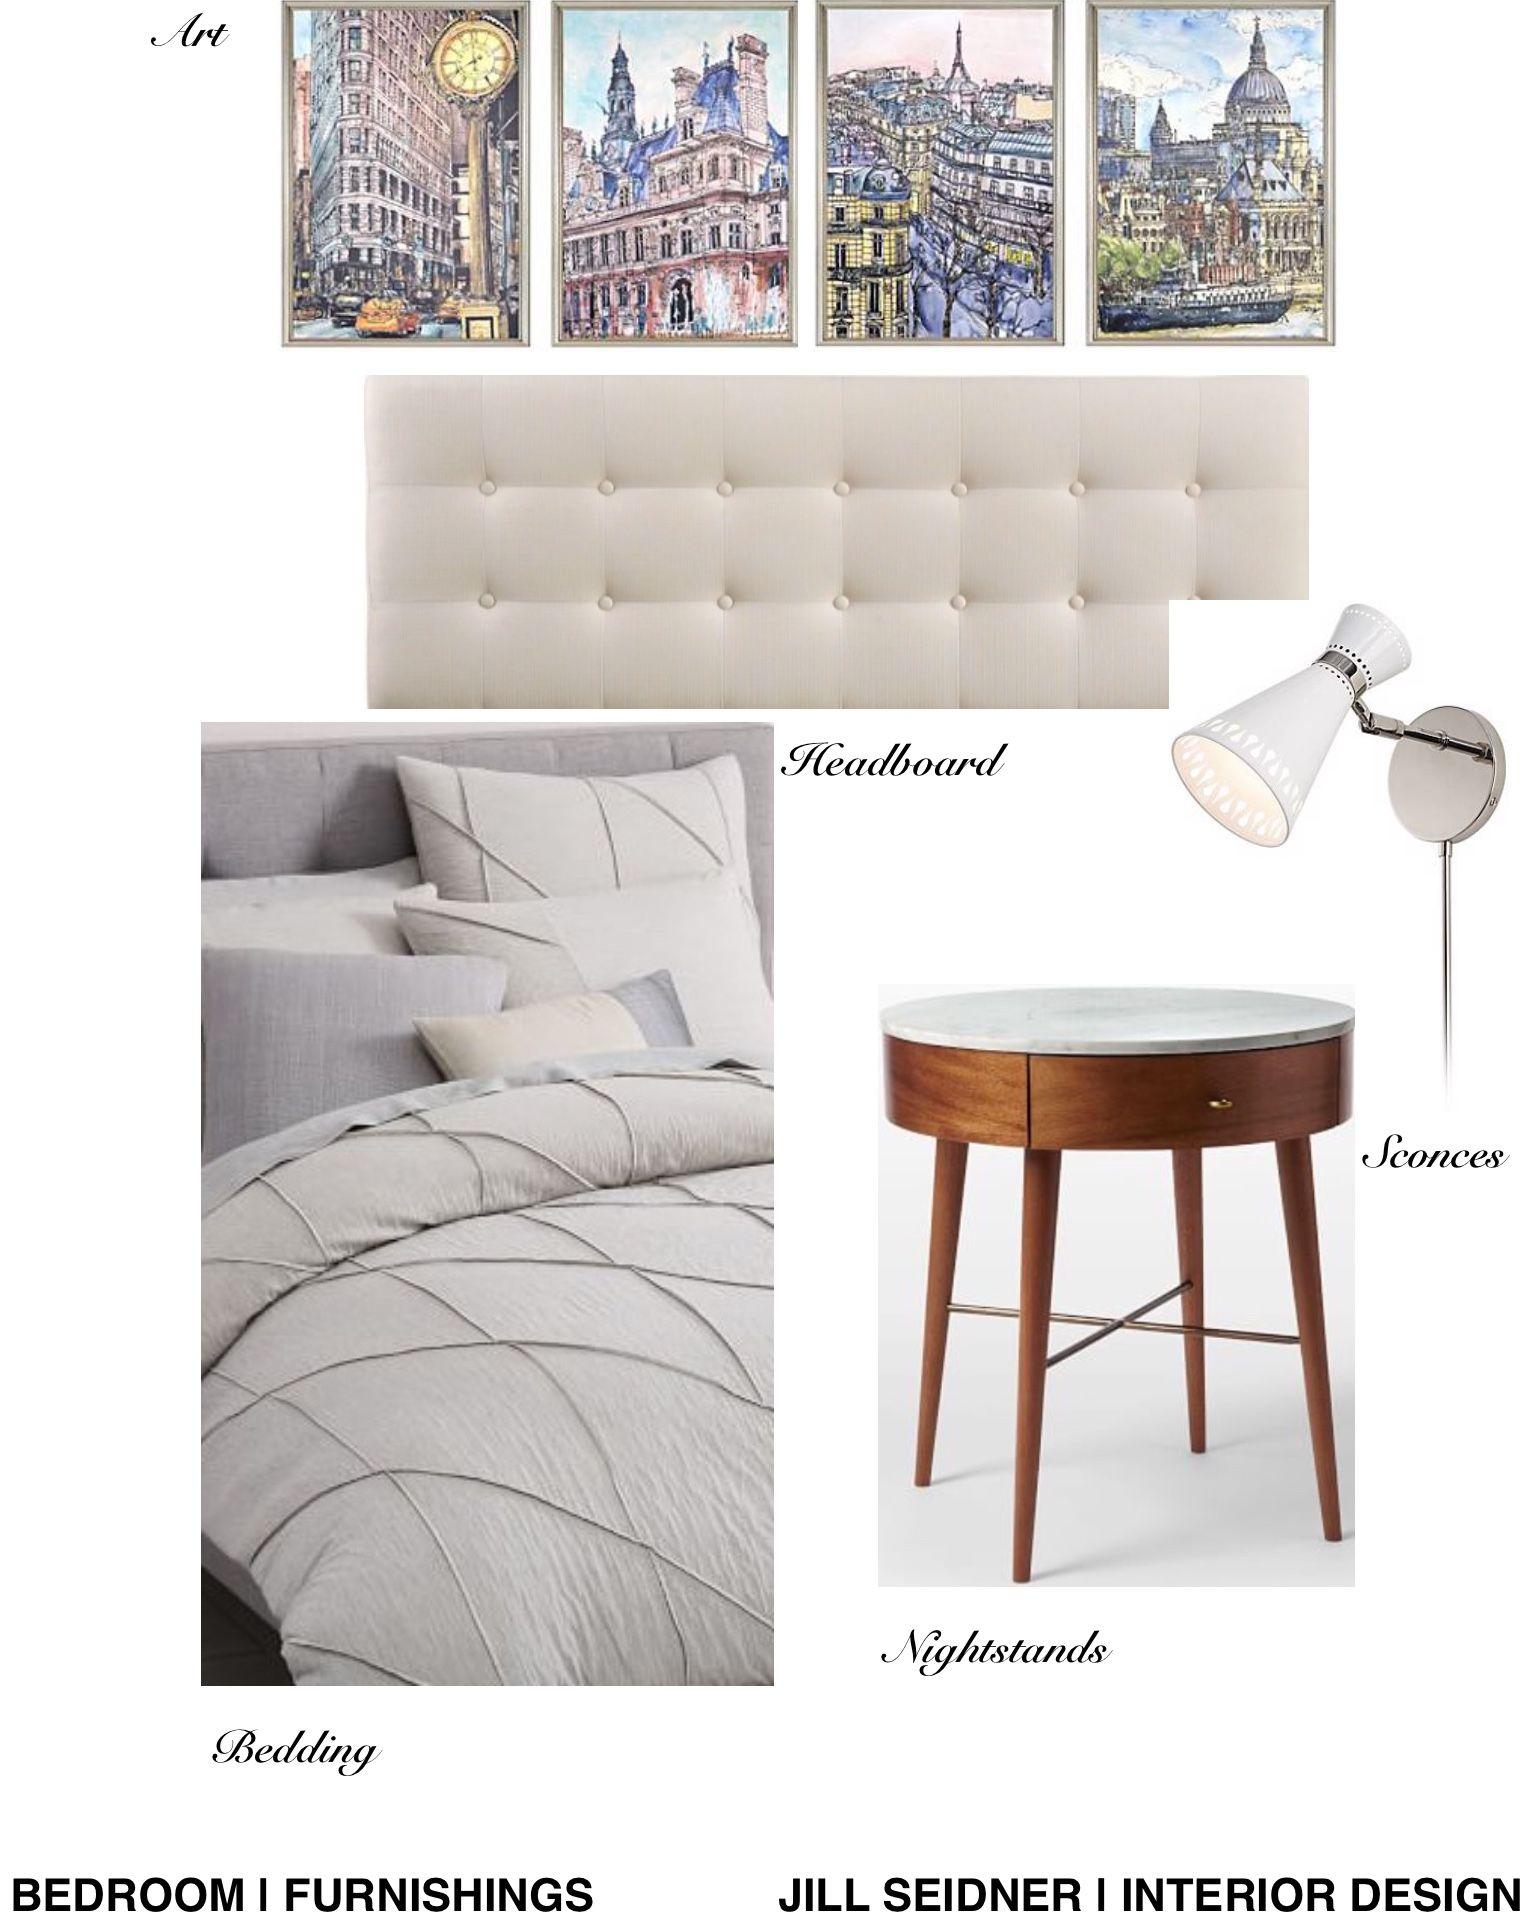 torrance ca residence guest bedroom furnishings concept board rh pinterest com